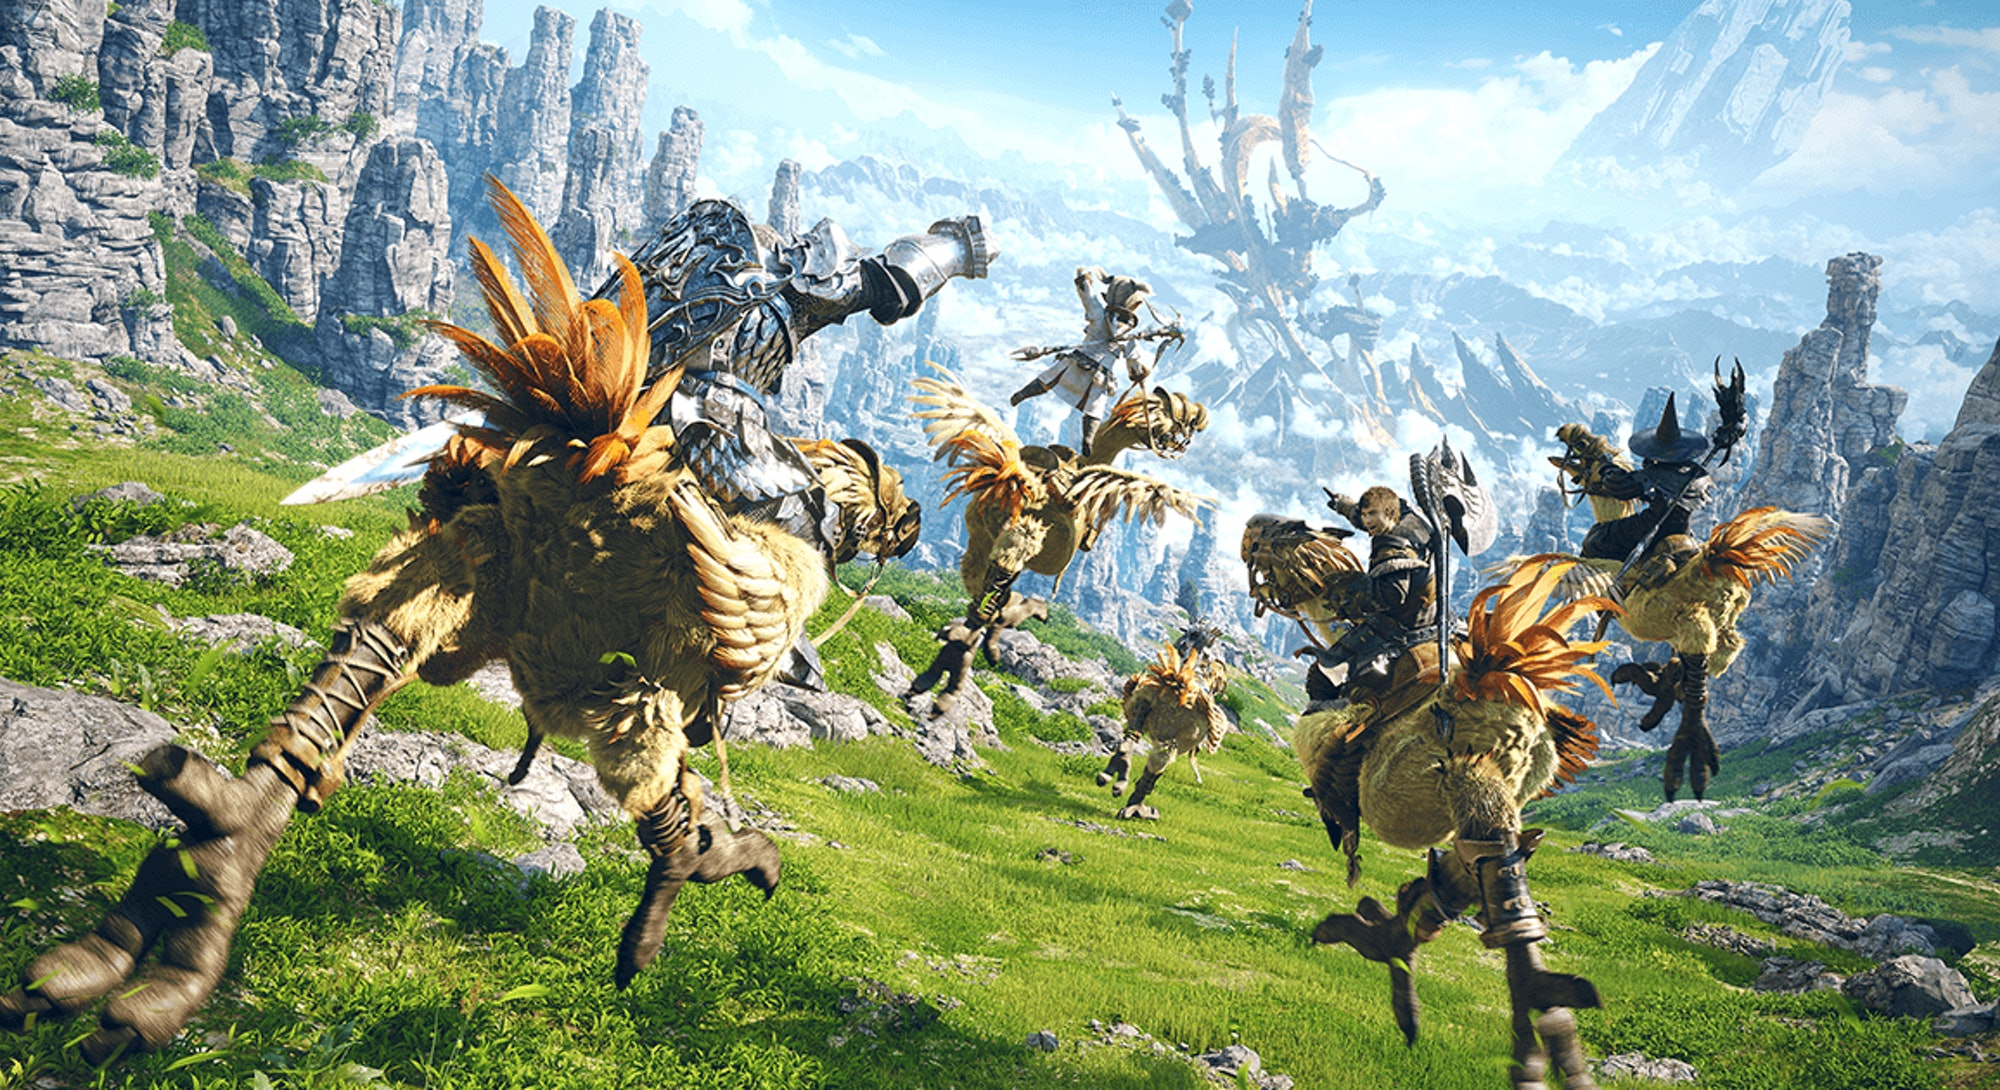 Final Fantasy 14 chocobos running through field